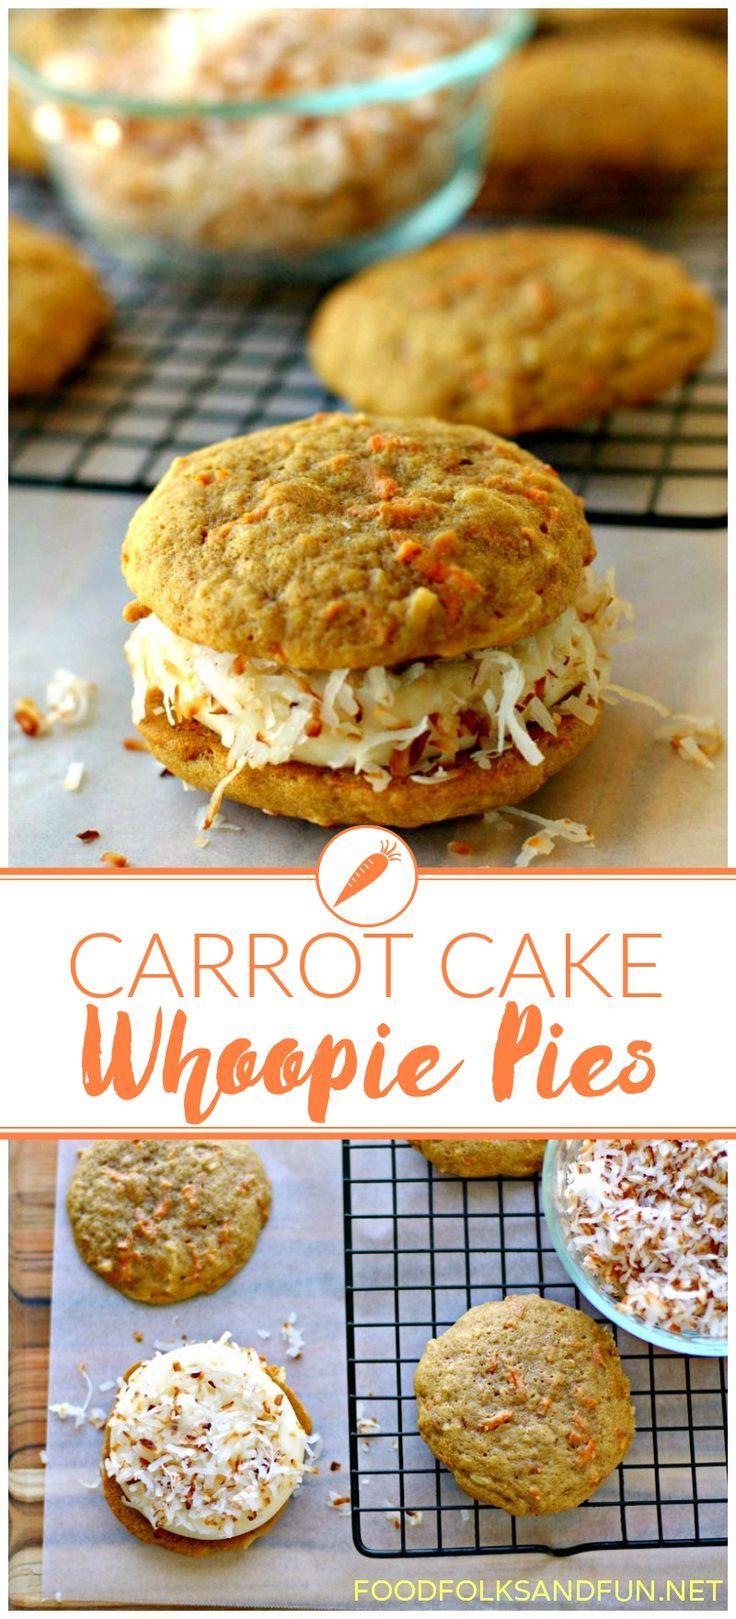 Carrot Cake Whoopie Pies with Coonut   Spring Dessert   Easter Desert   Bake Sale Recipe